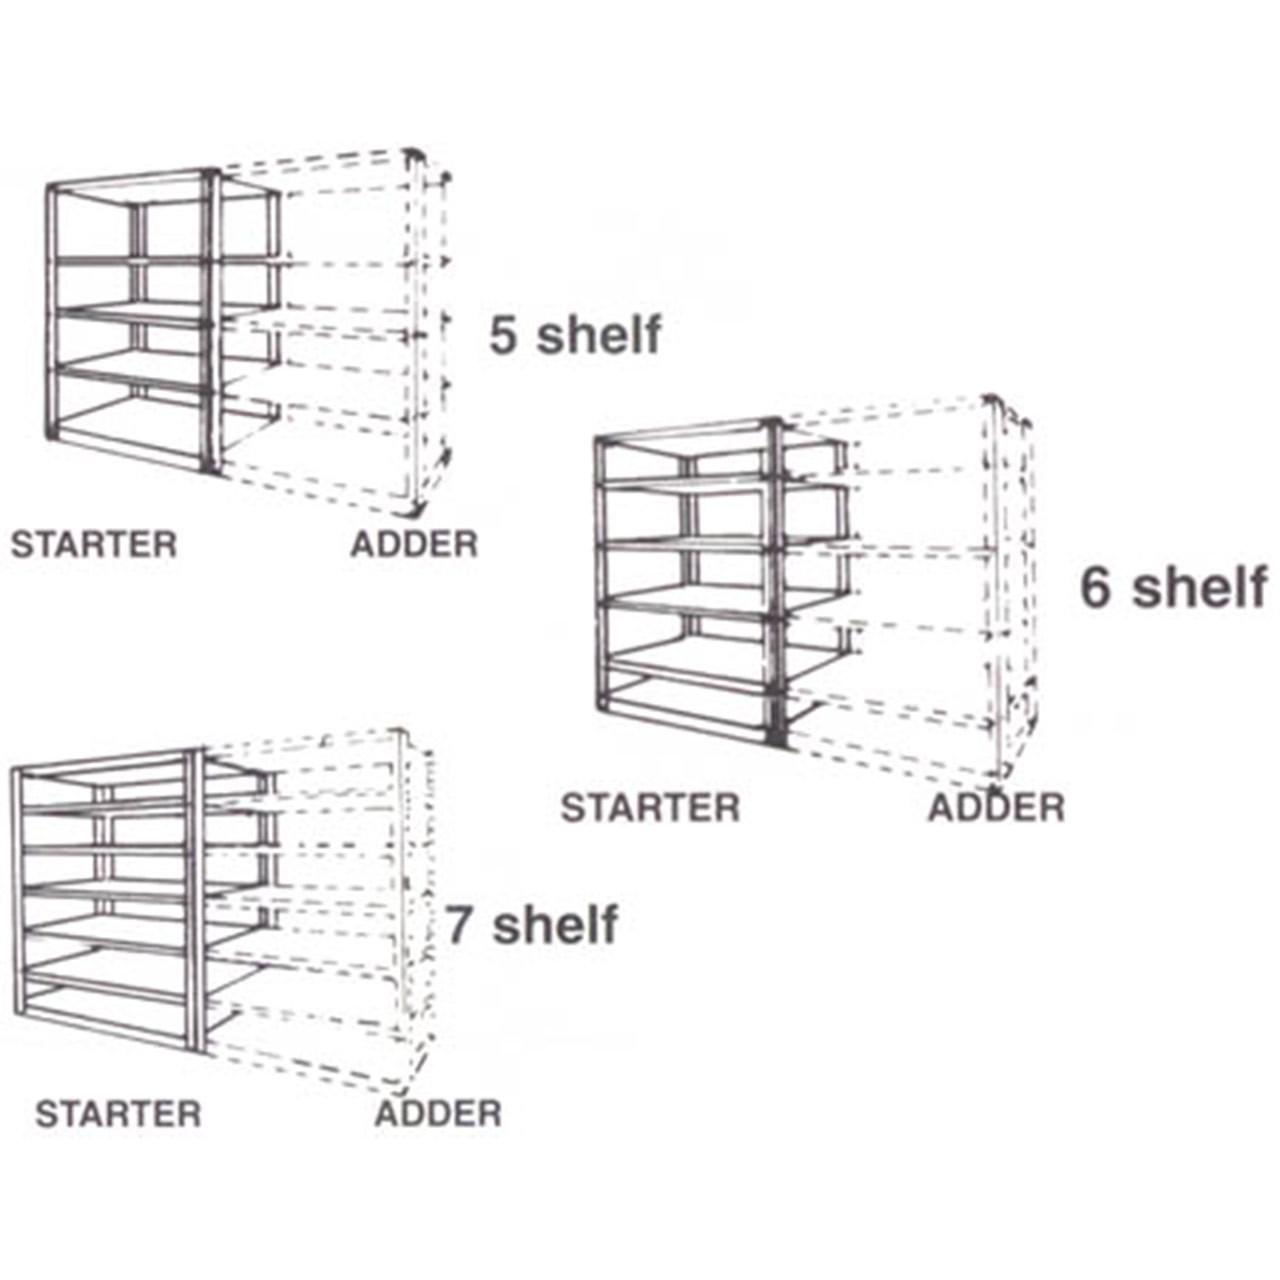 Low Profile Boltless Shelving Adder Diagram